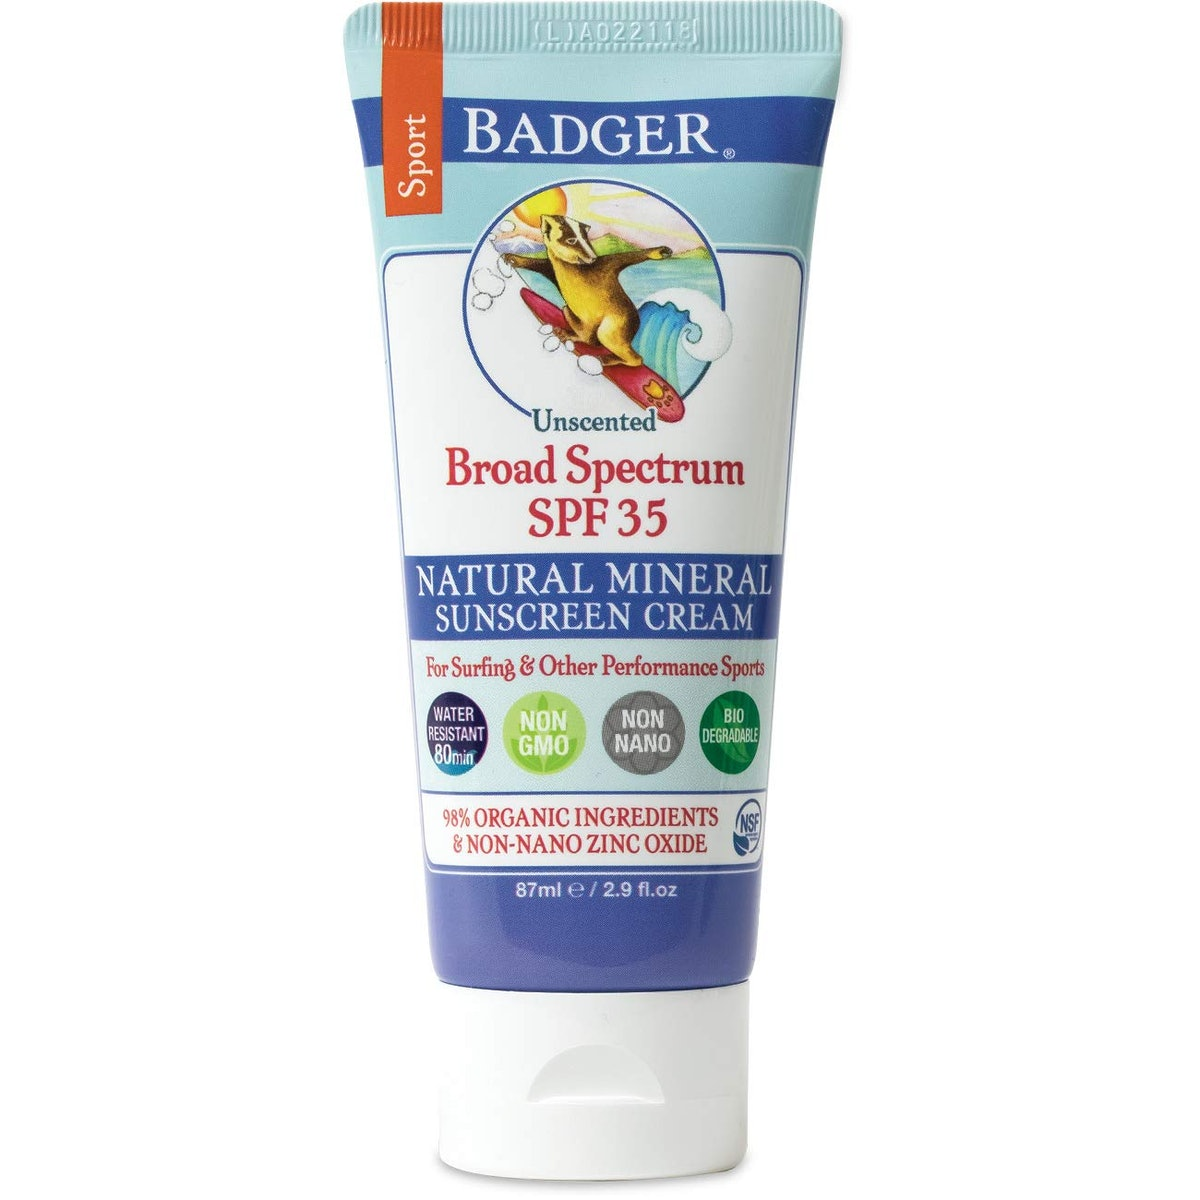 Badger Natural Mineral Sunscreen Cream